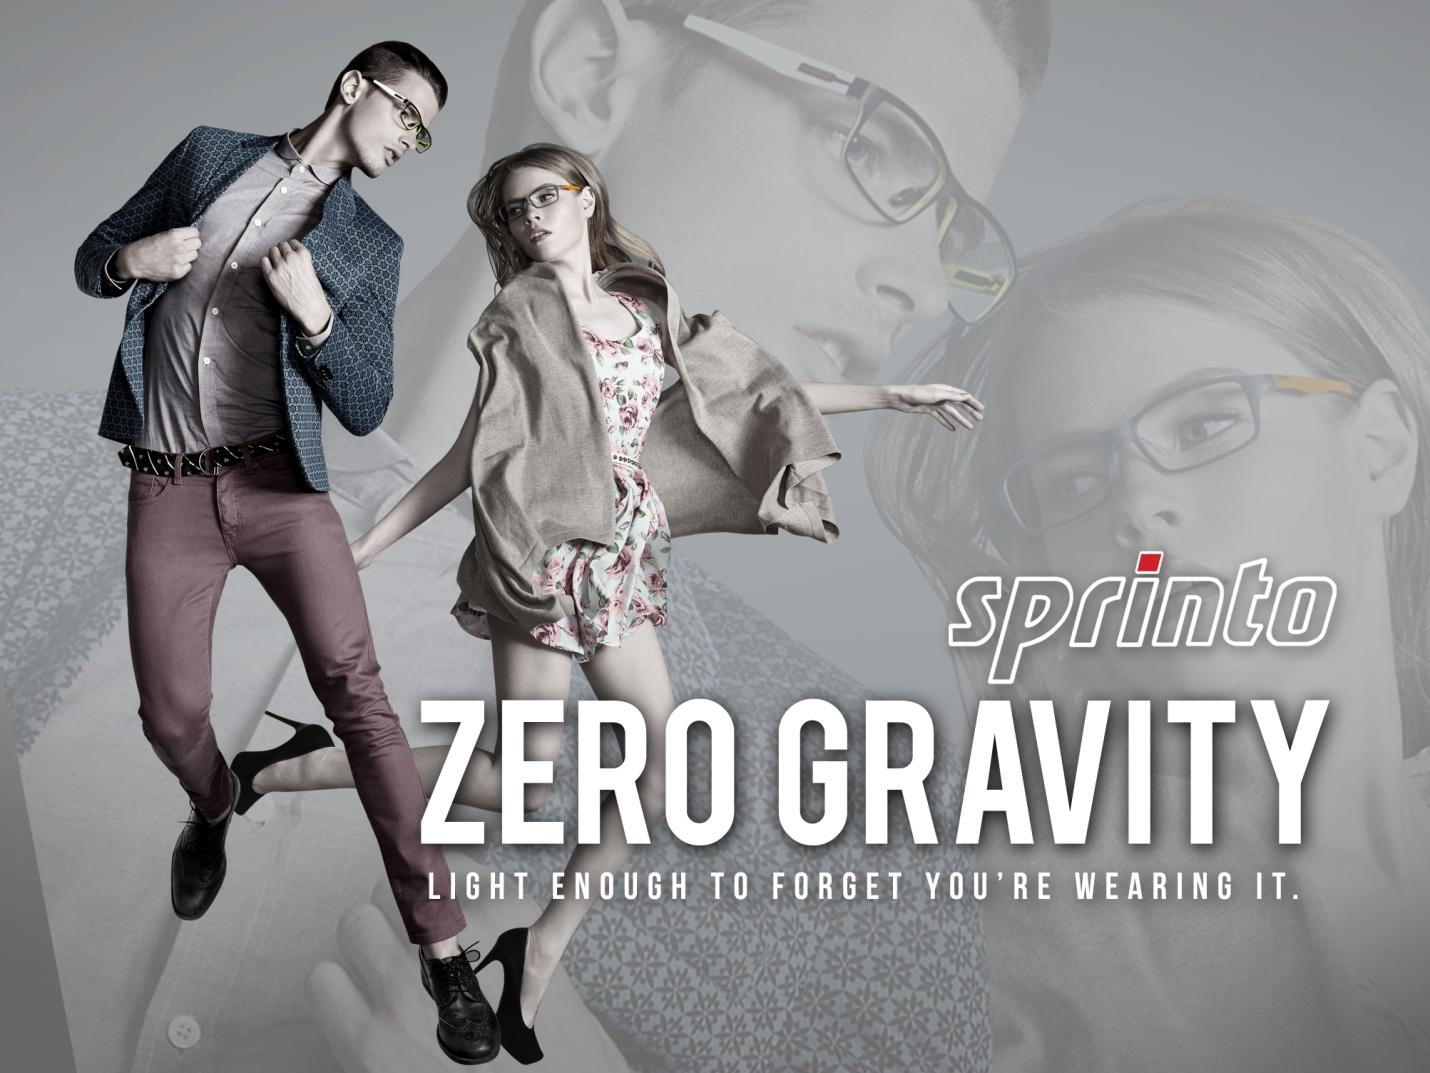 Zero Gravity: Sprintos Ultra-Light Eyewear ~ Viva Manilena